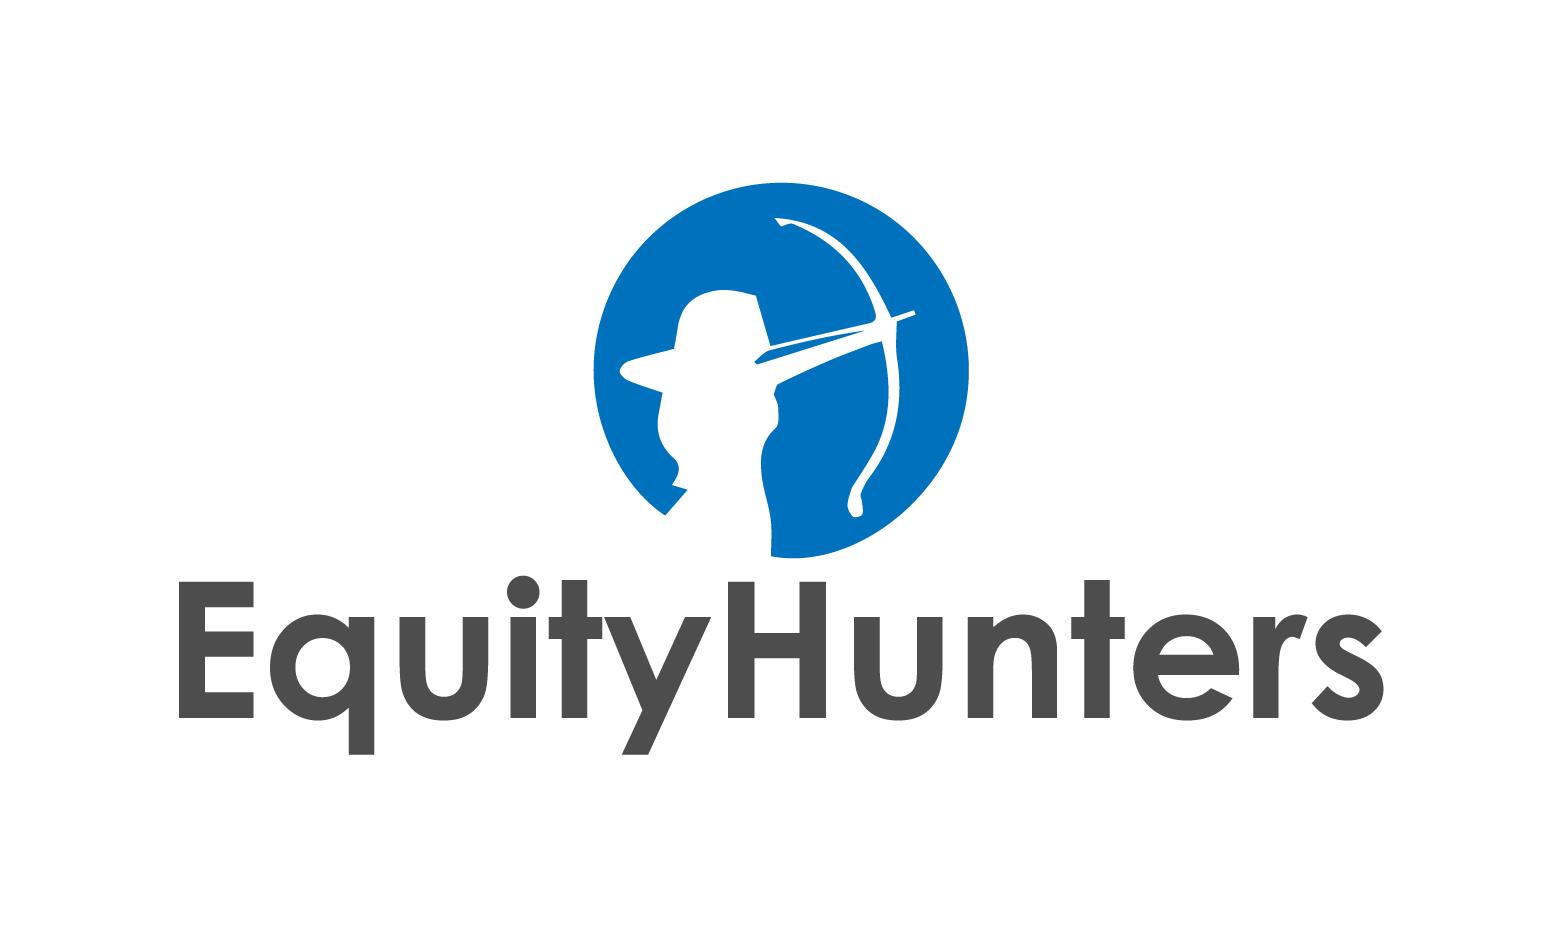 EquityHunters.com